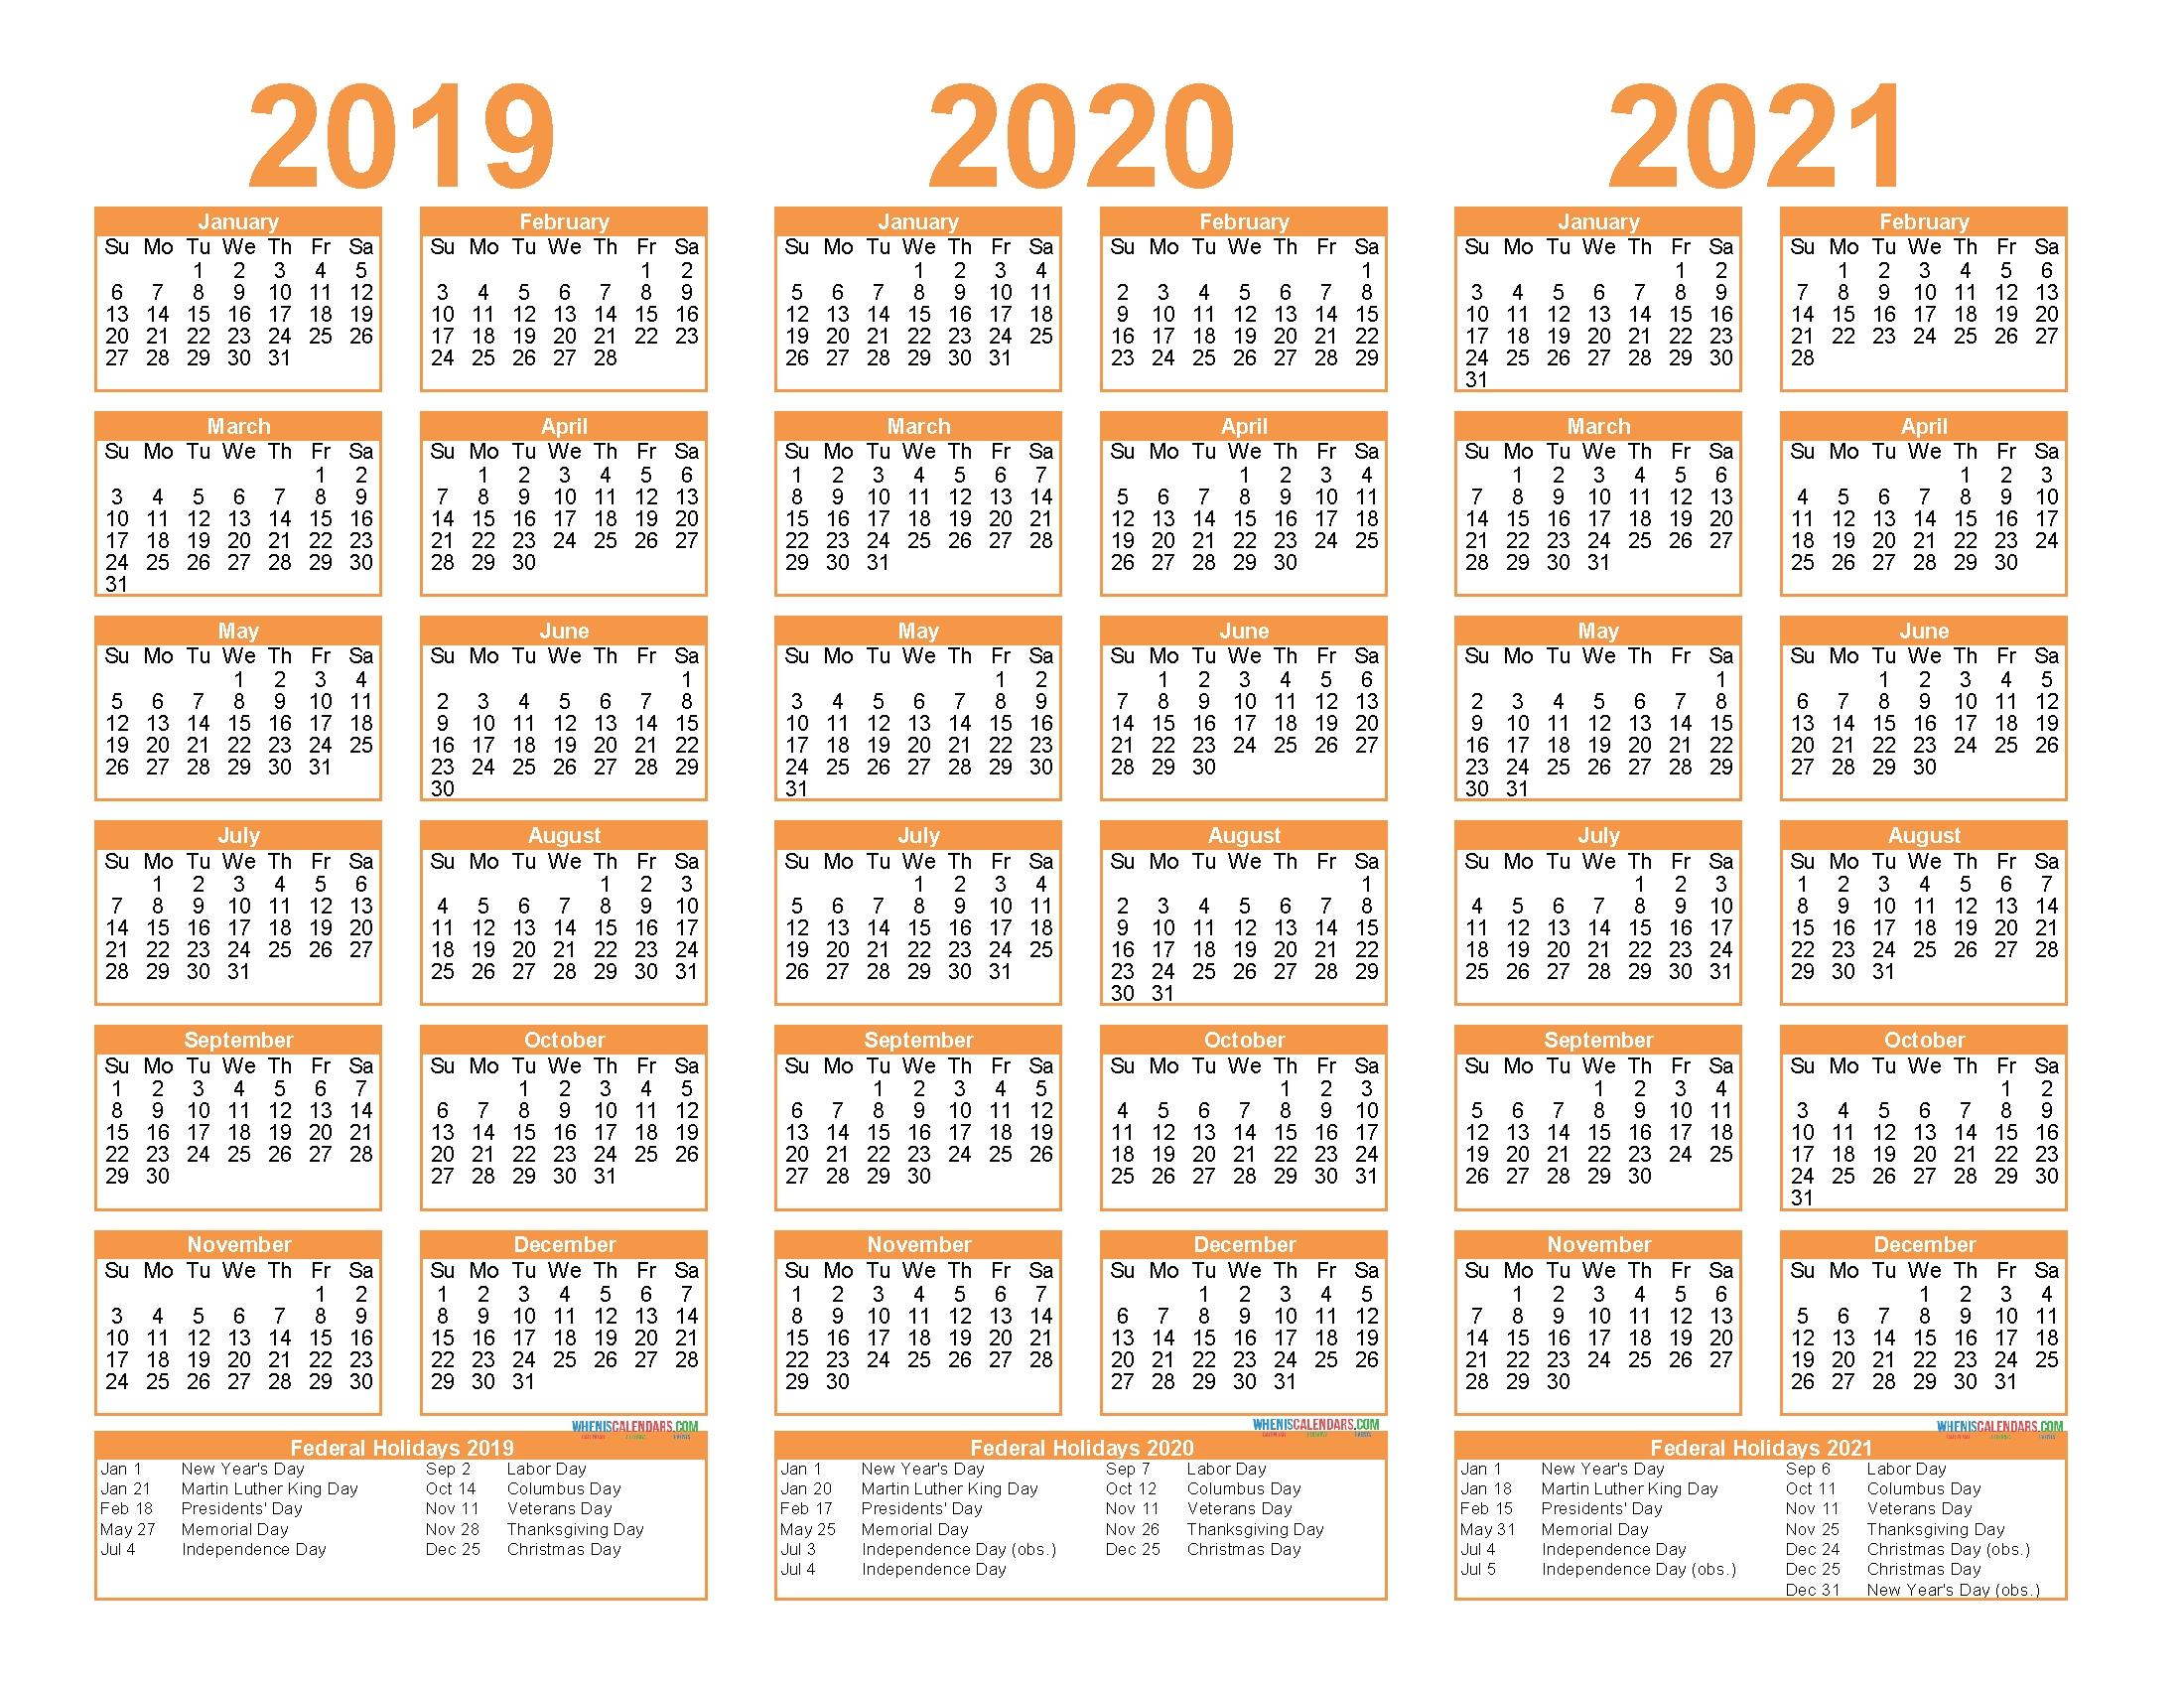 Free Printable 2019 2020 2021 Calendar With Holidays – Free with 3 Year Calendar 2019 2020 2021 Printable